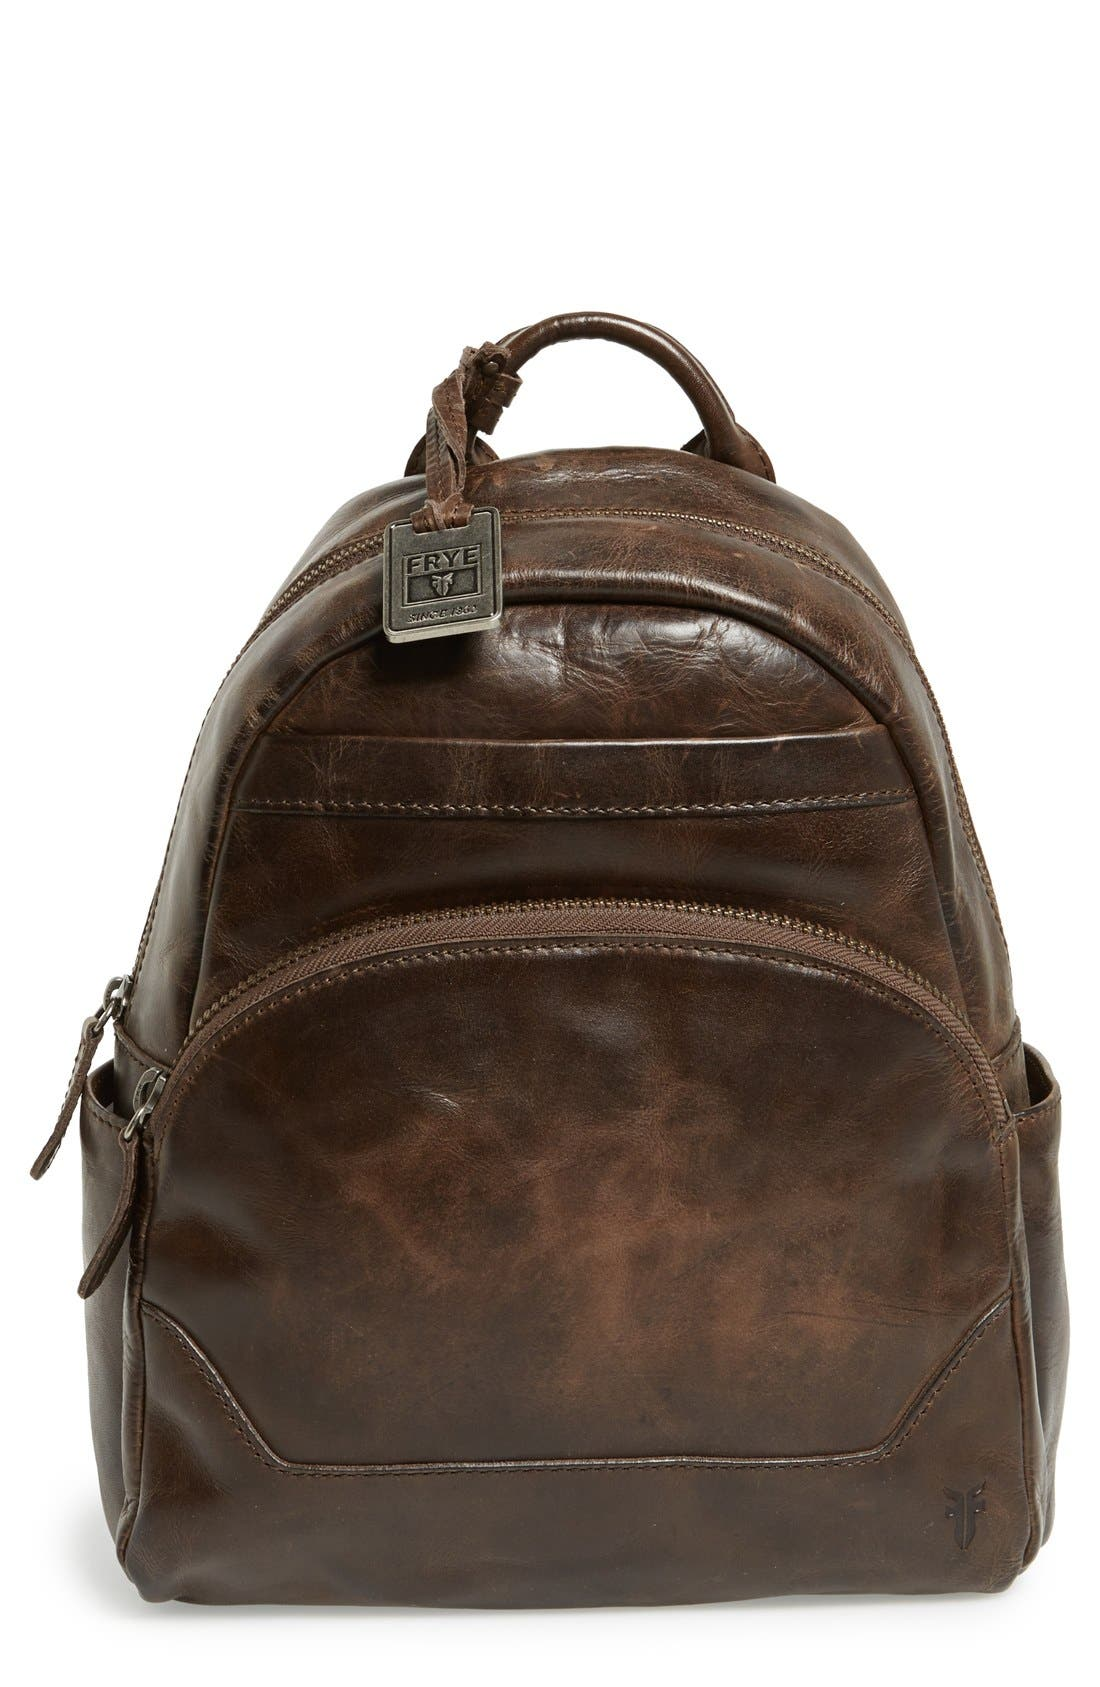 Alternate Image 1 Selected - Frye 'Melissa' Backpack